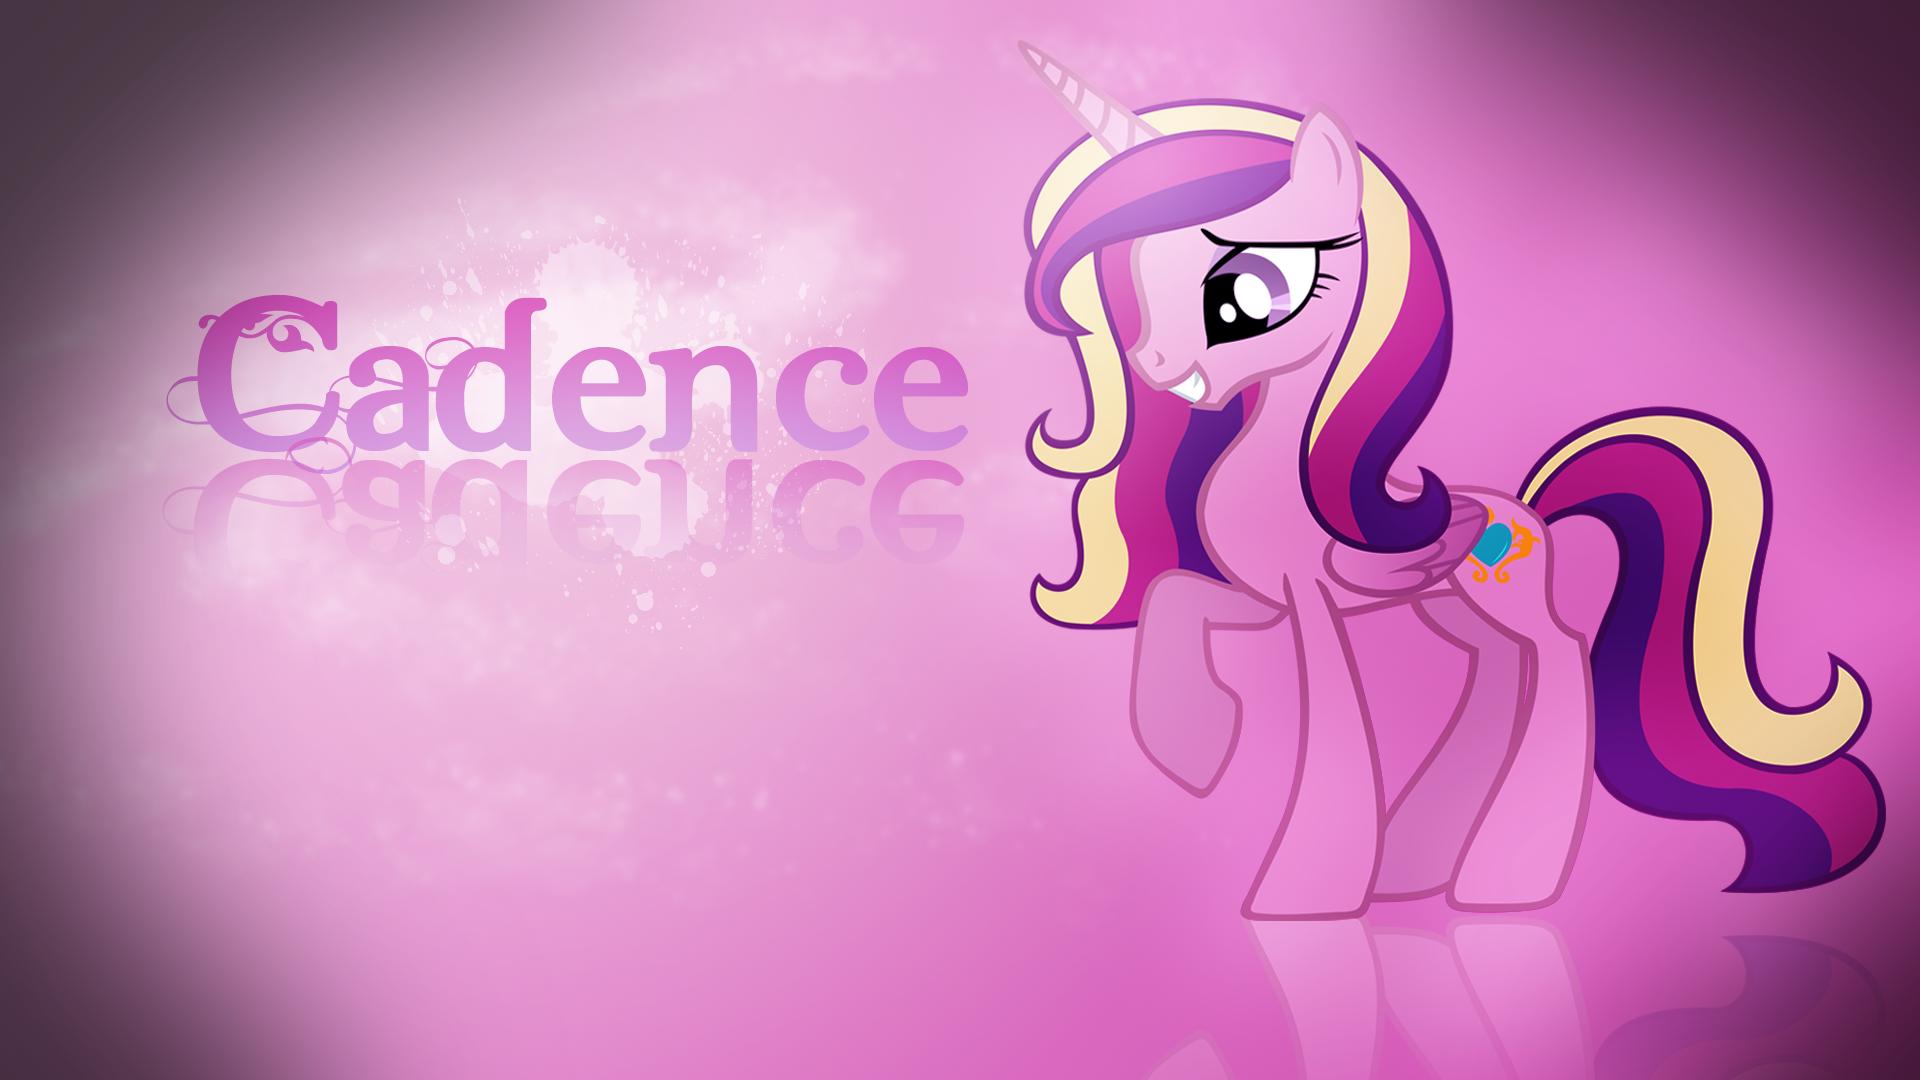 Princess Cadence Wallpaper by DraikJack and TygerxL